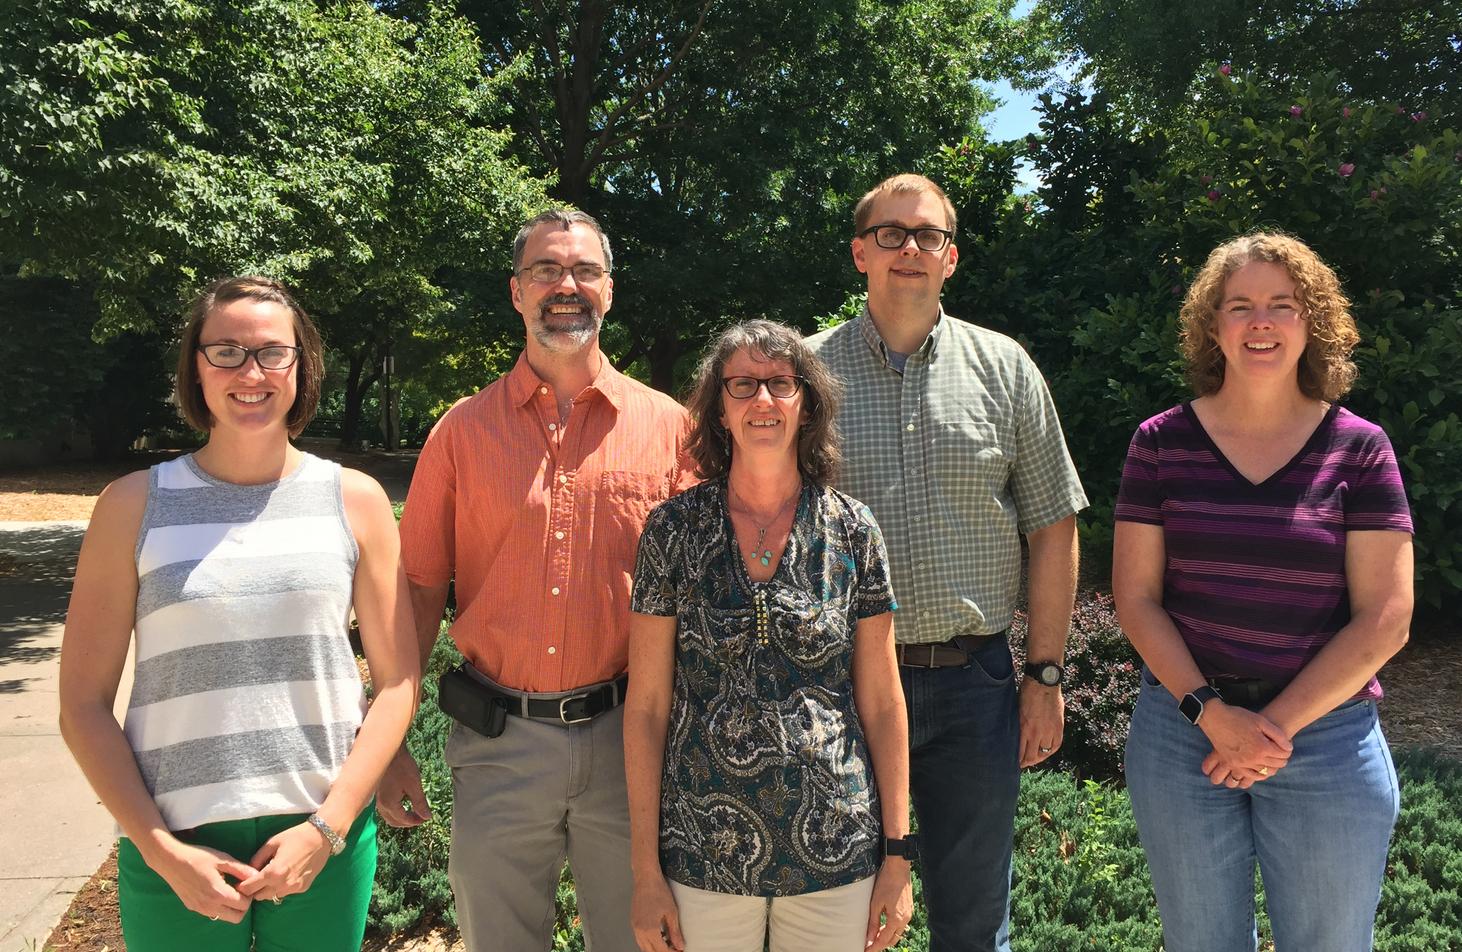 KSU Research Team Gets $10.6 Million Grant